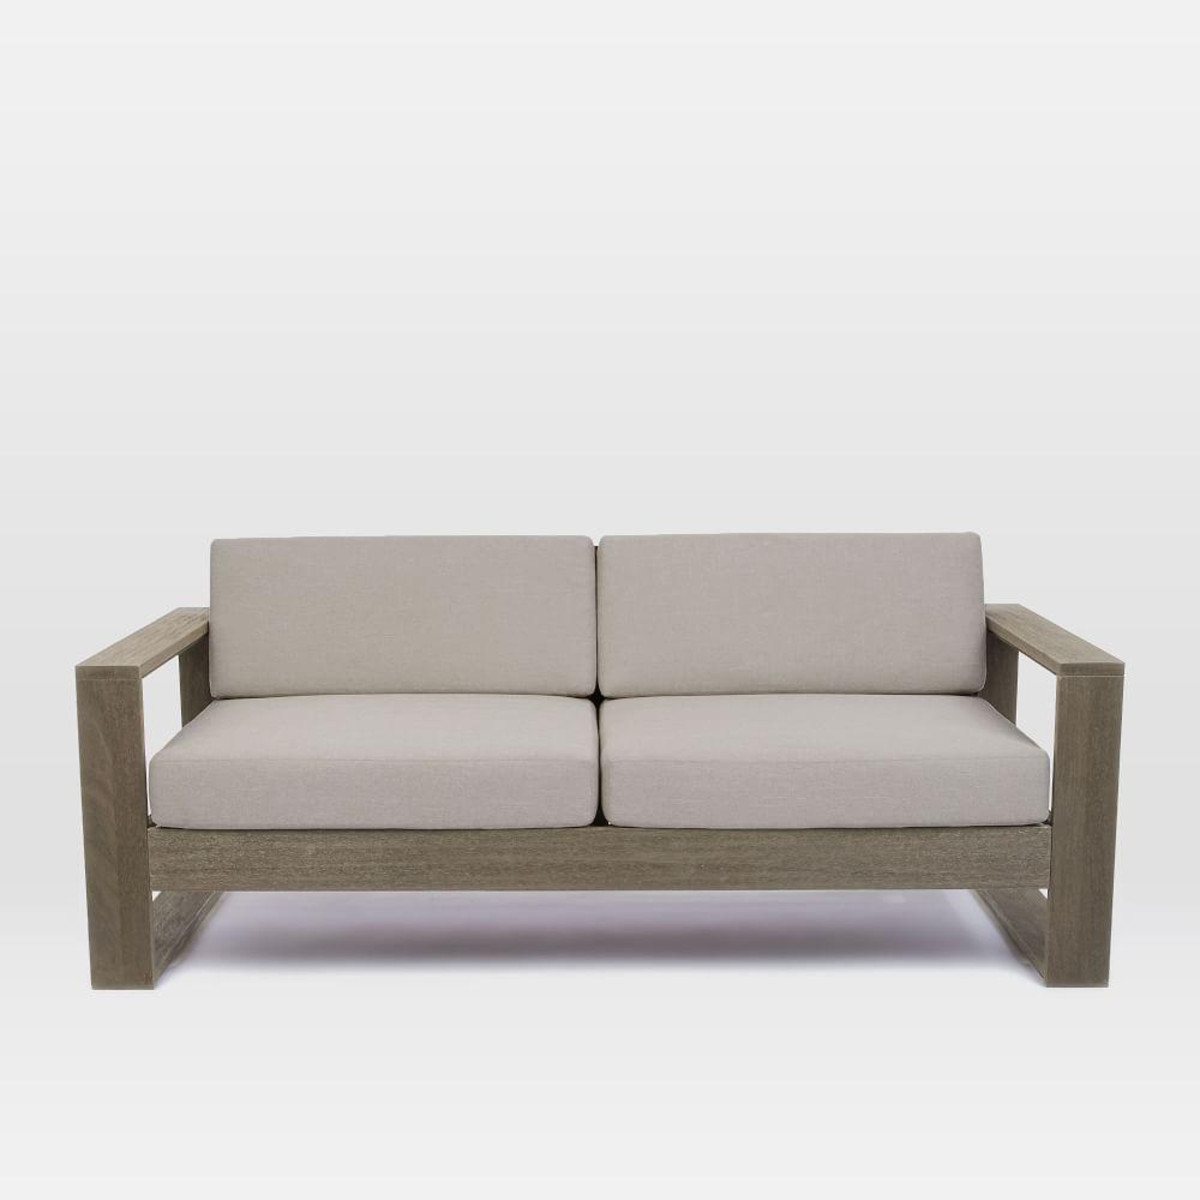 West Elm -  Portside sofa £1,299